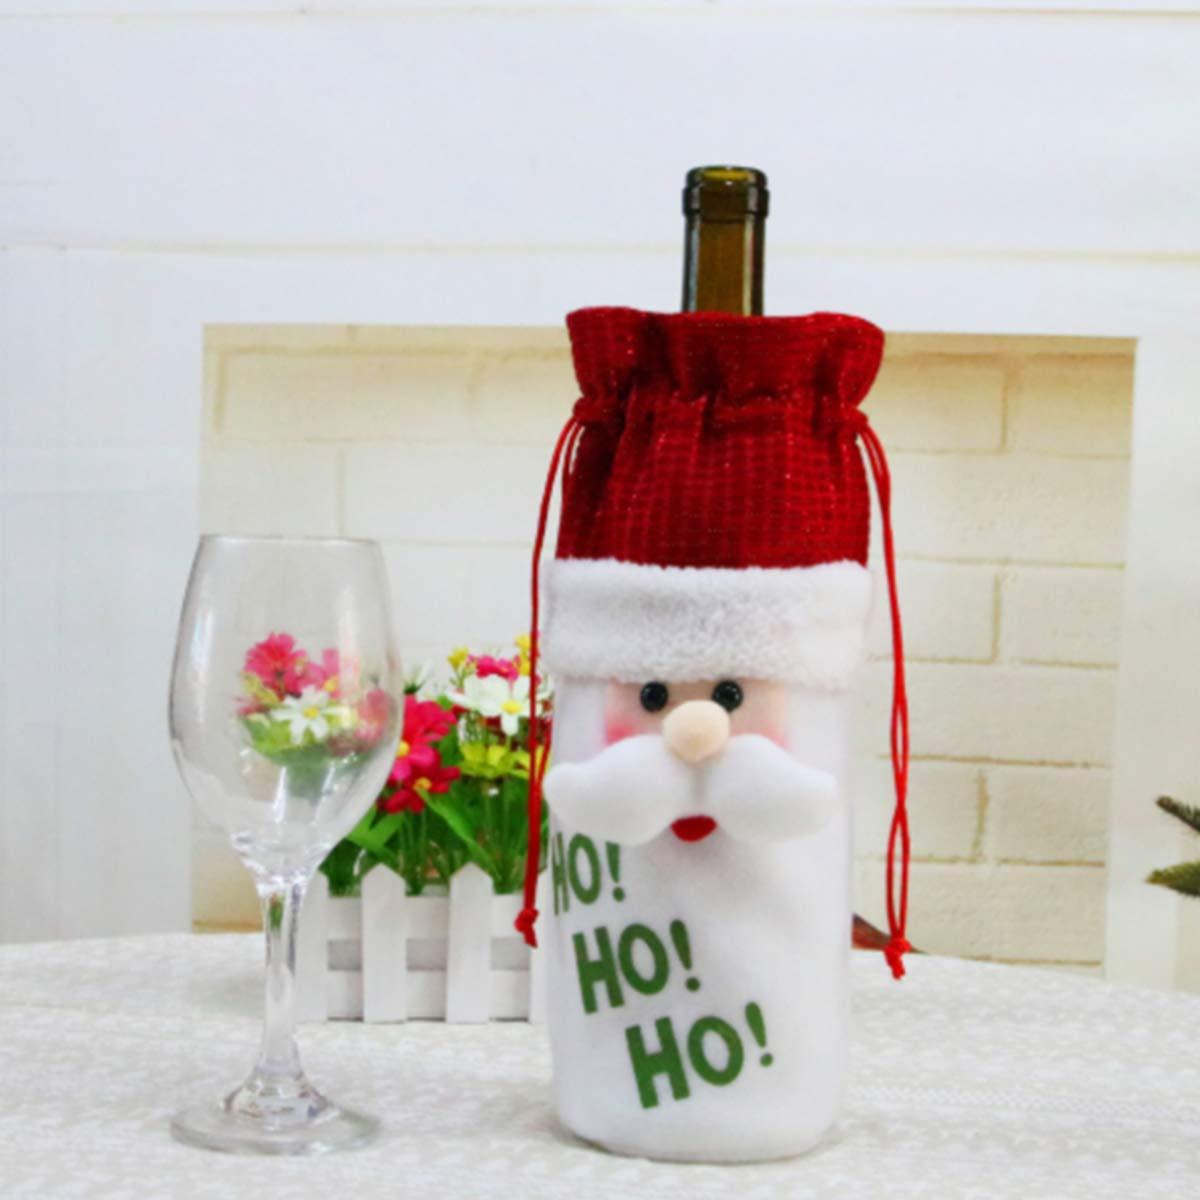 MODOAO Christmas Gift Bags Santa Sacks Drawstring Toys Holder Kids Candy Bags Portable Christmas Handbag Santa Sack Backpack for Party Favors 3 Pack,13x6.3